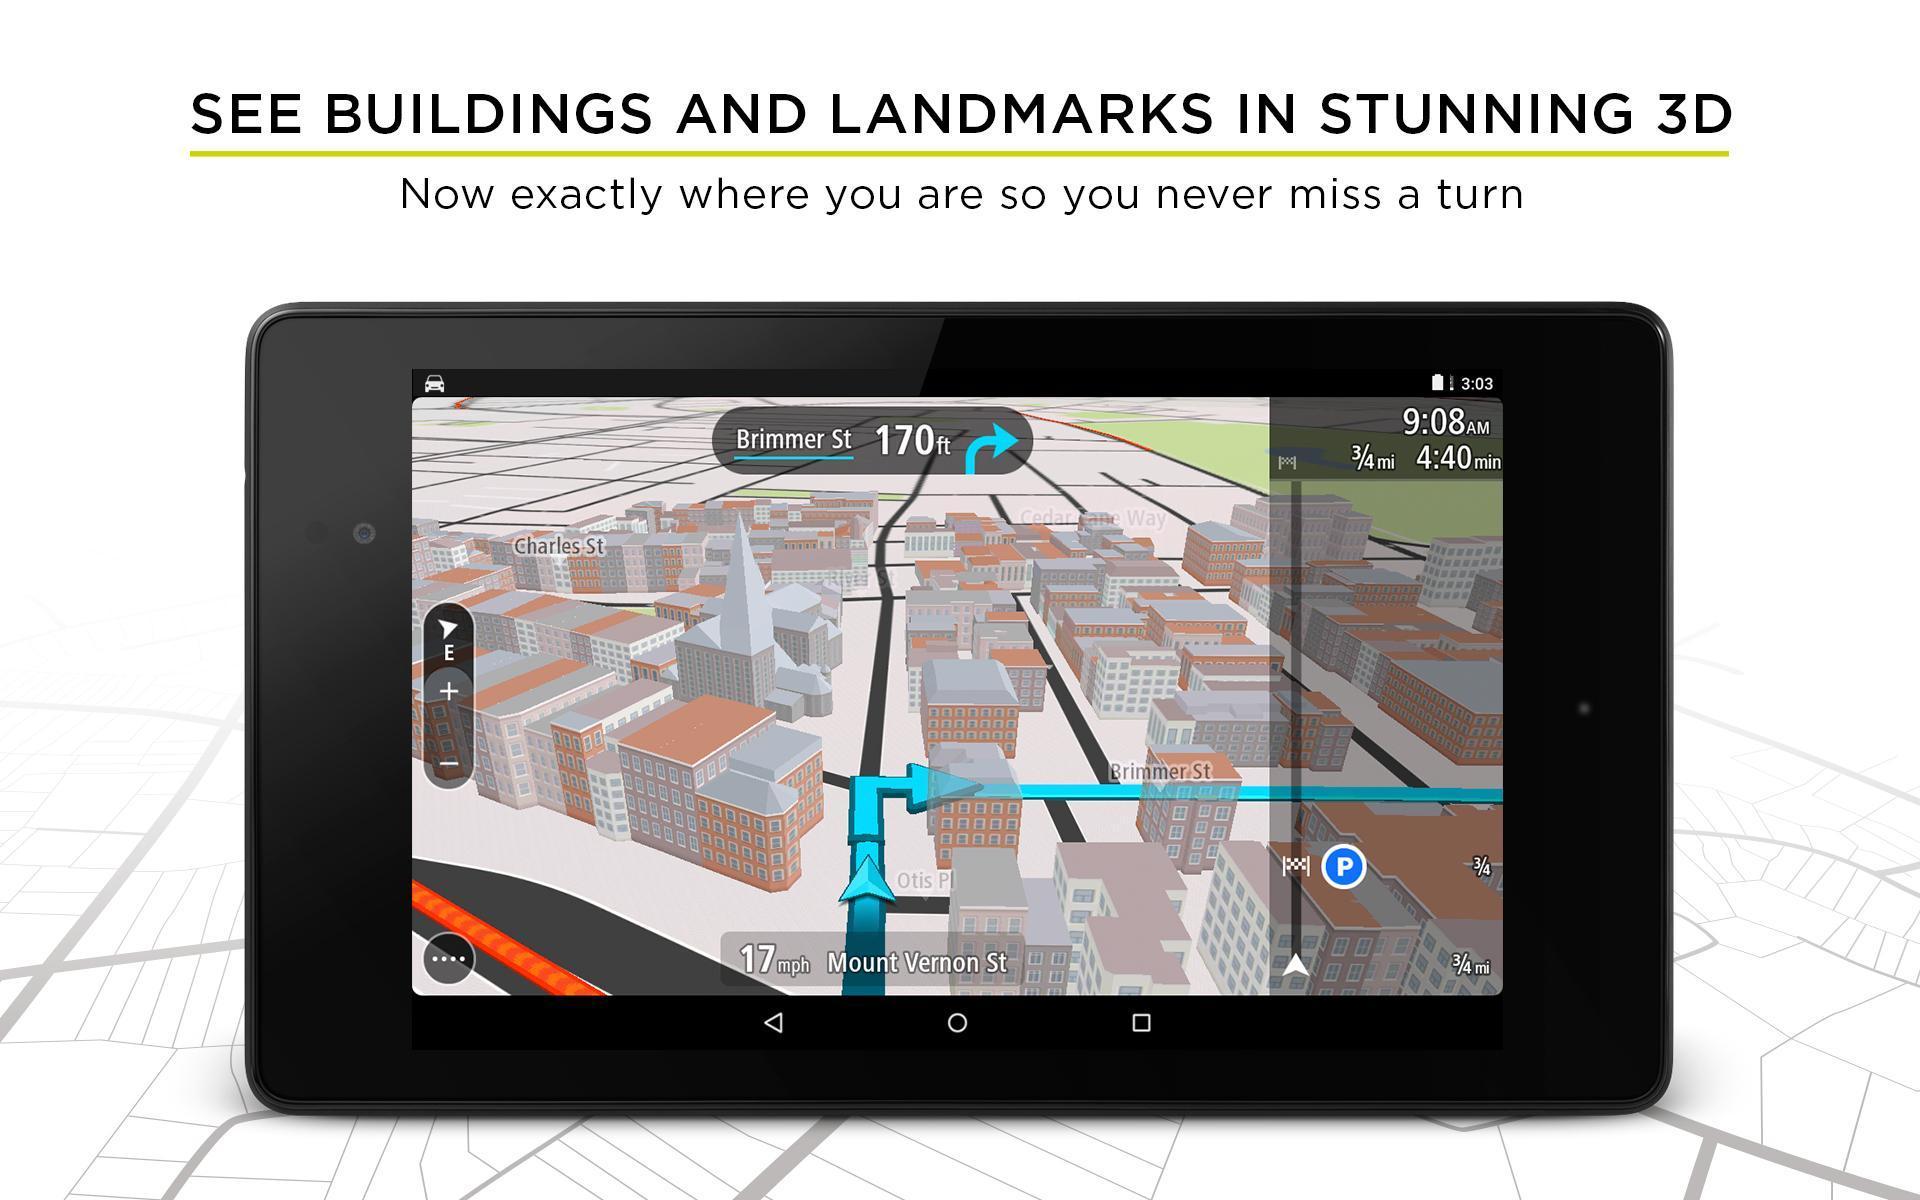 TomTom GPS Navigation - Live Traffic Alerts & Maps 2.0.4 Screenshot 18